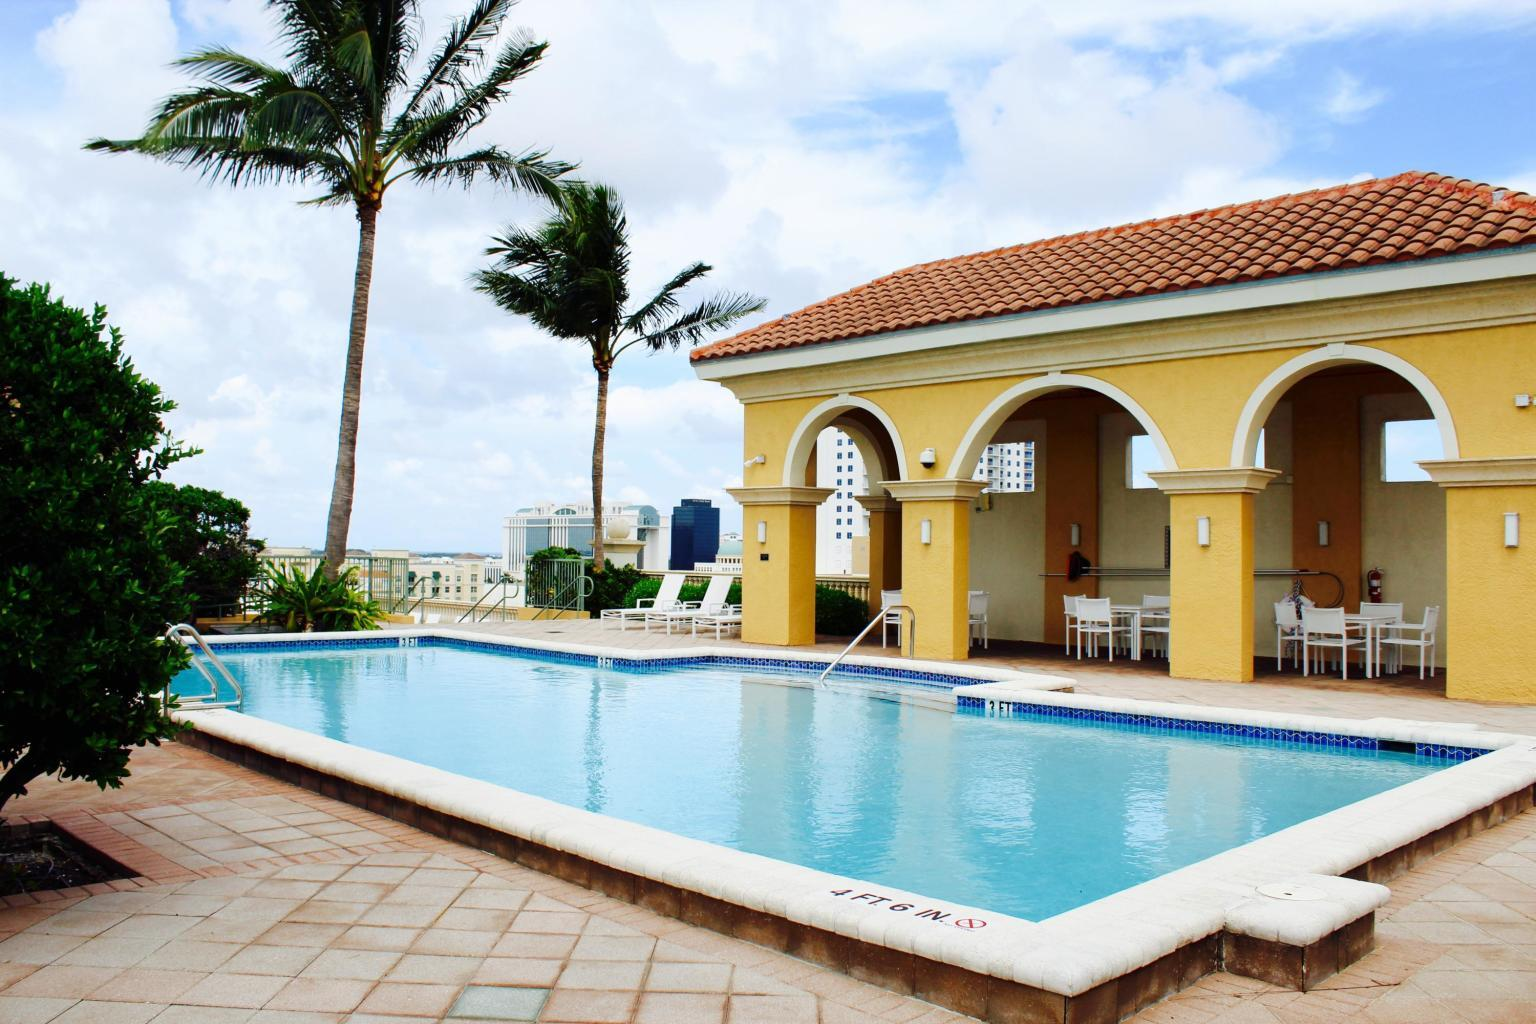 403 Sapodilla Avenue, West Palm Beach, Florida 33401, 3 Bedrooms Bedrooms, ,2 BathroomsBathrooms,Rental,For Rent,Sapodilla,RX-10632592